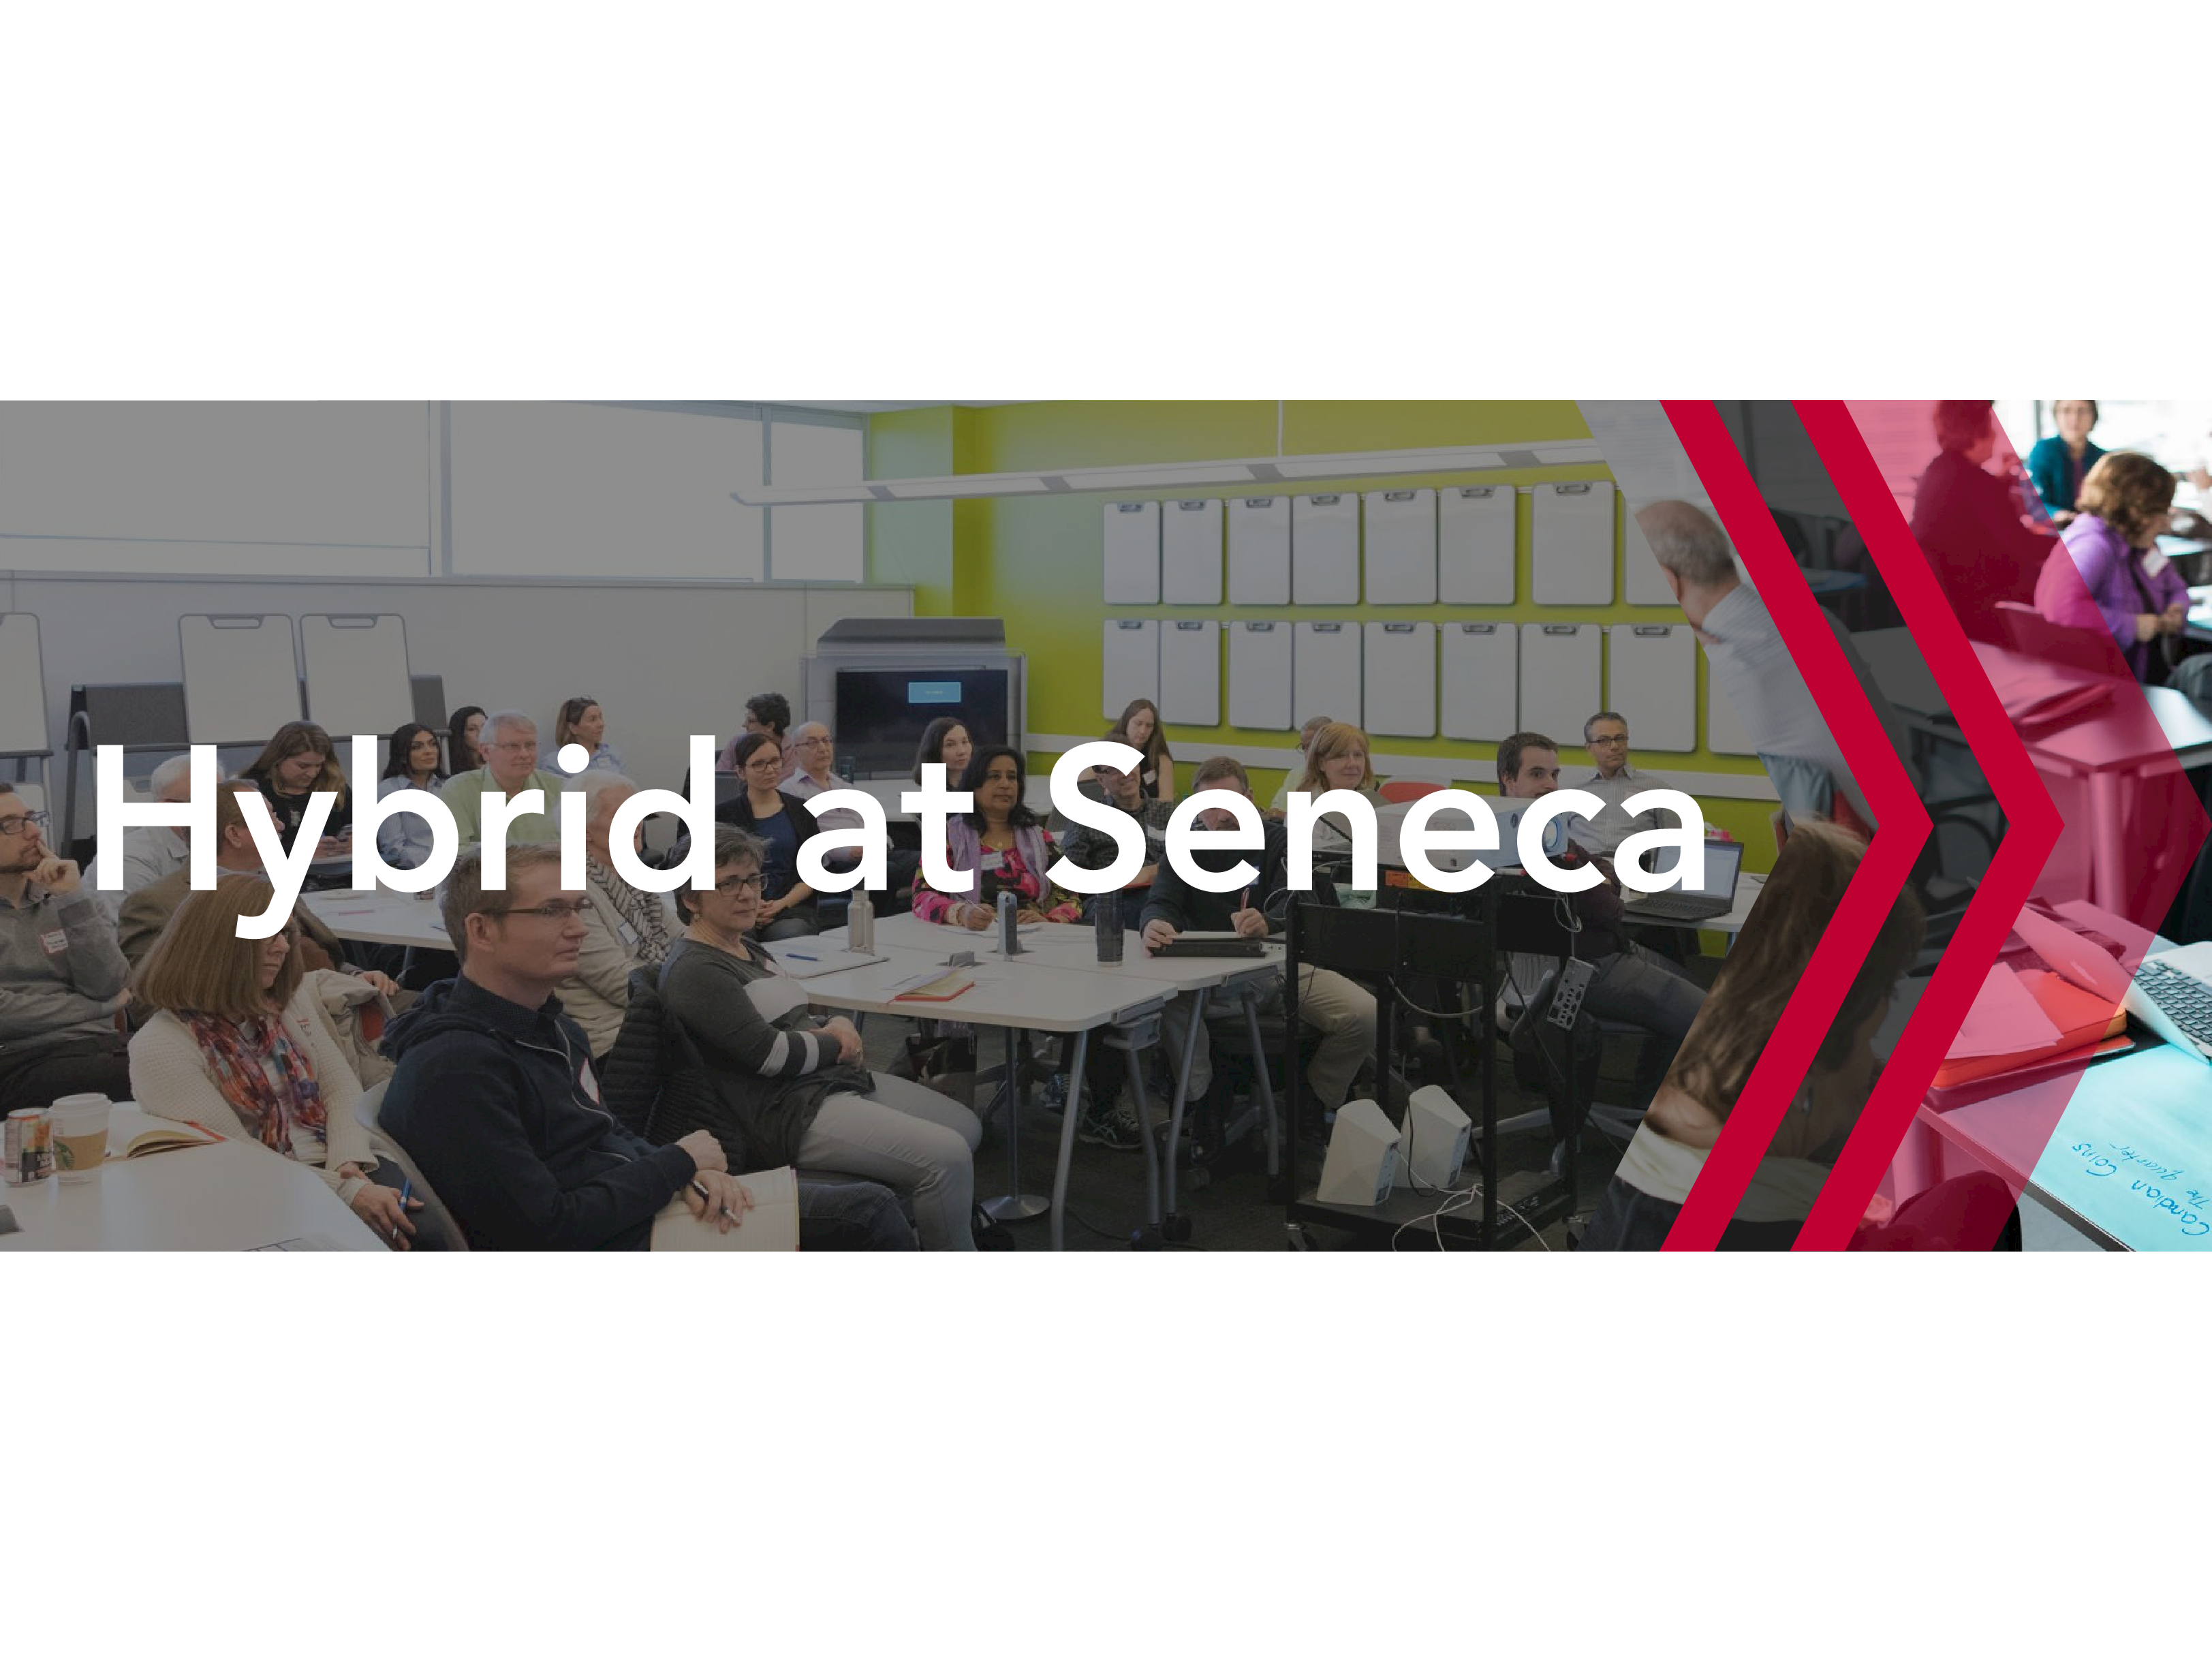 Hybrid at Seneca